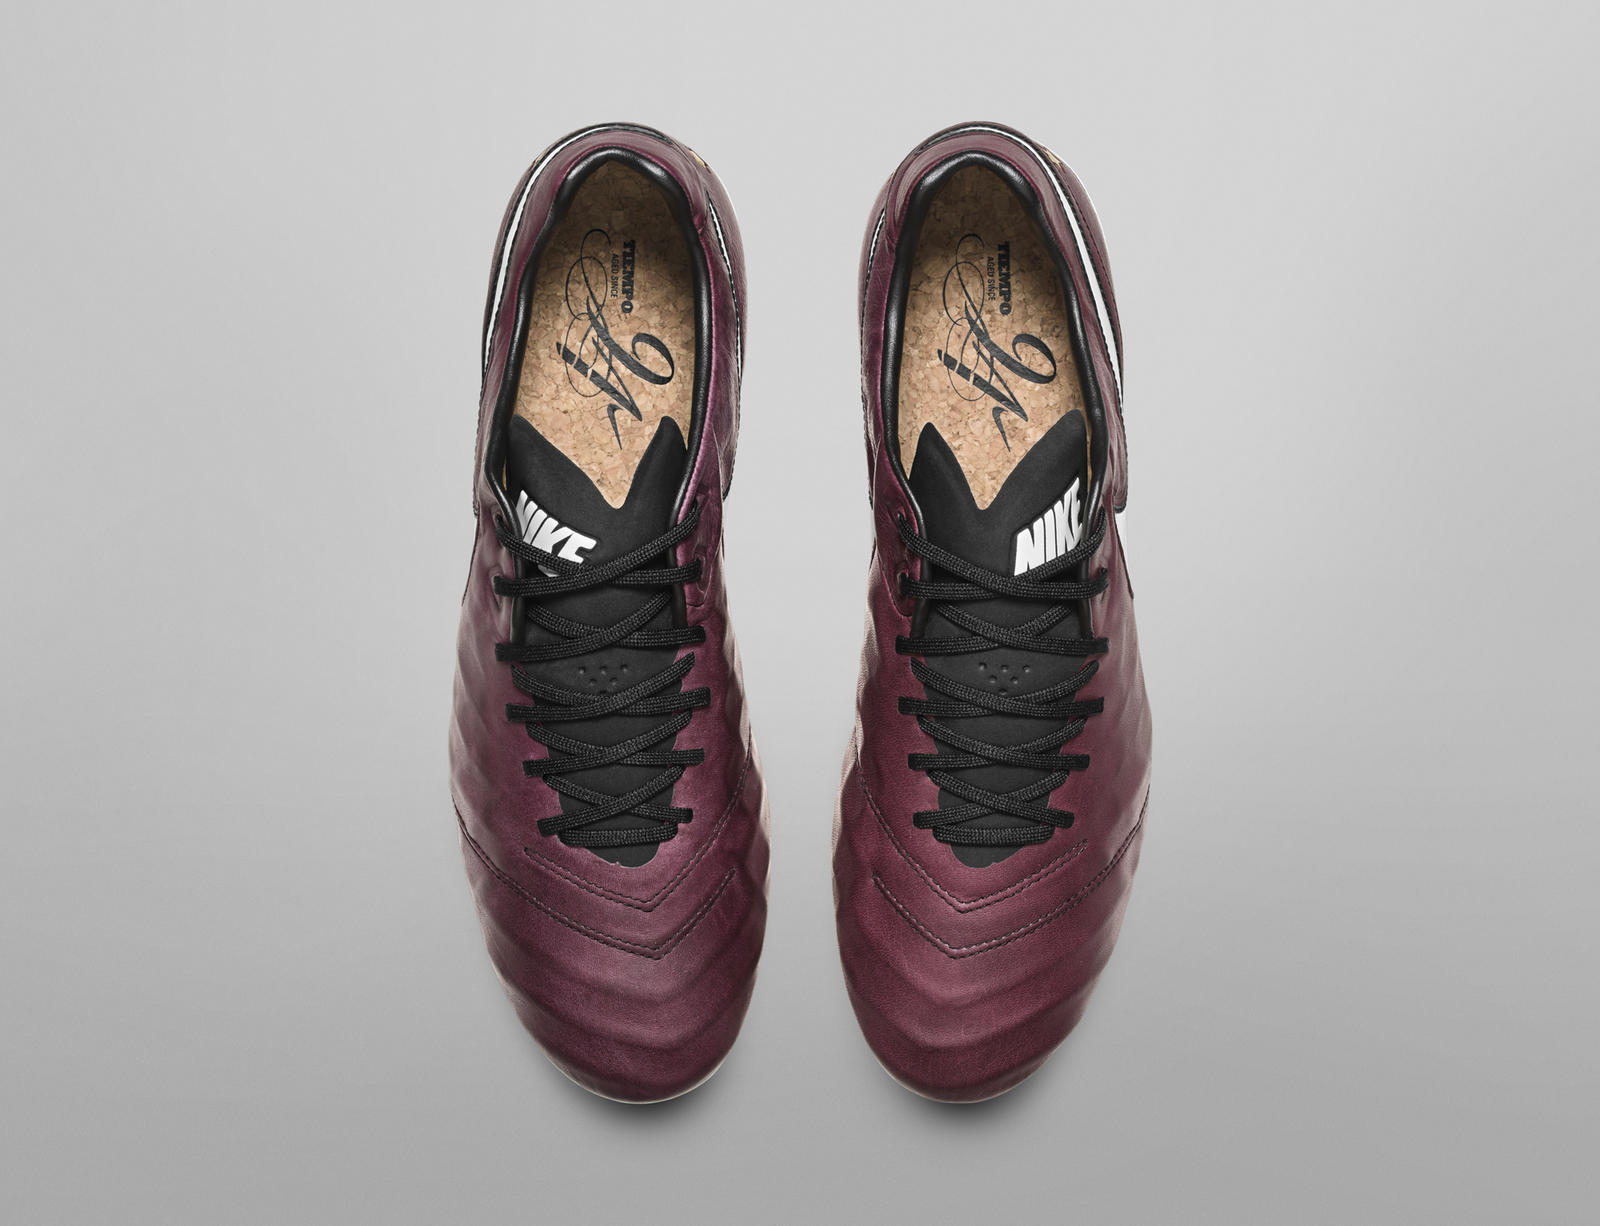 642afc4b7c6 Tiempo Pirlo - Nike News